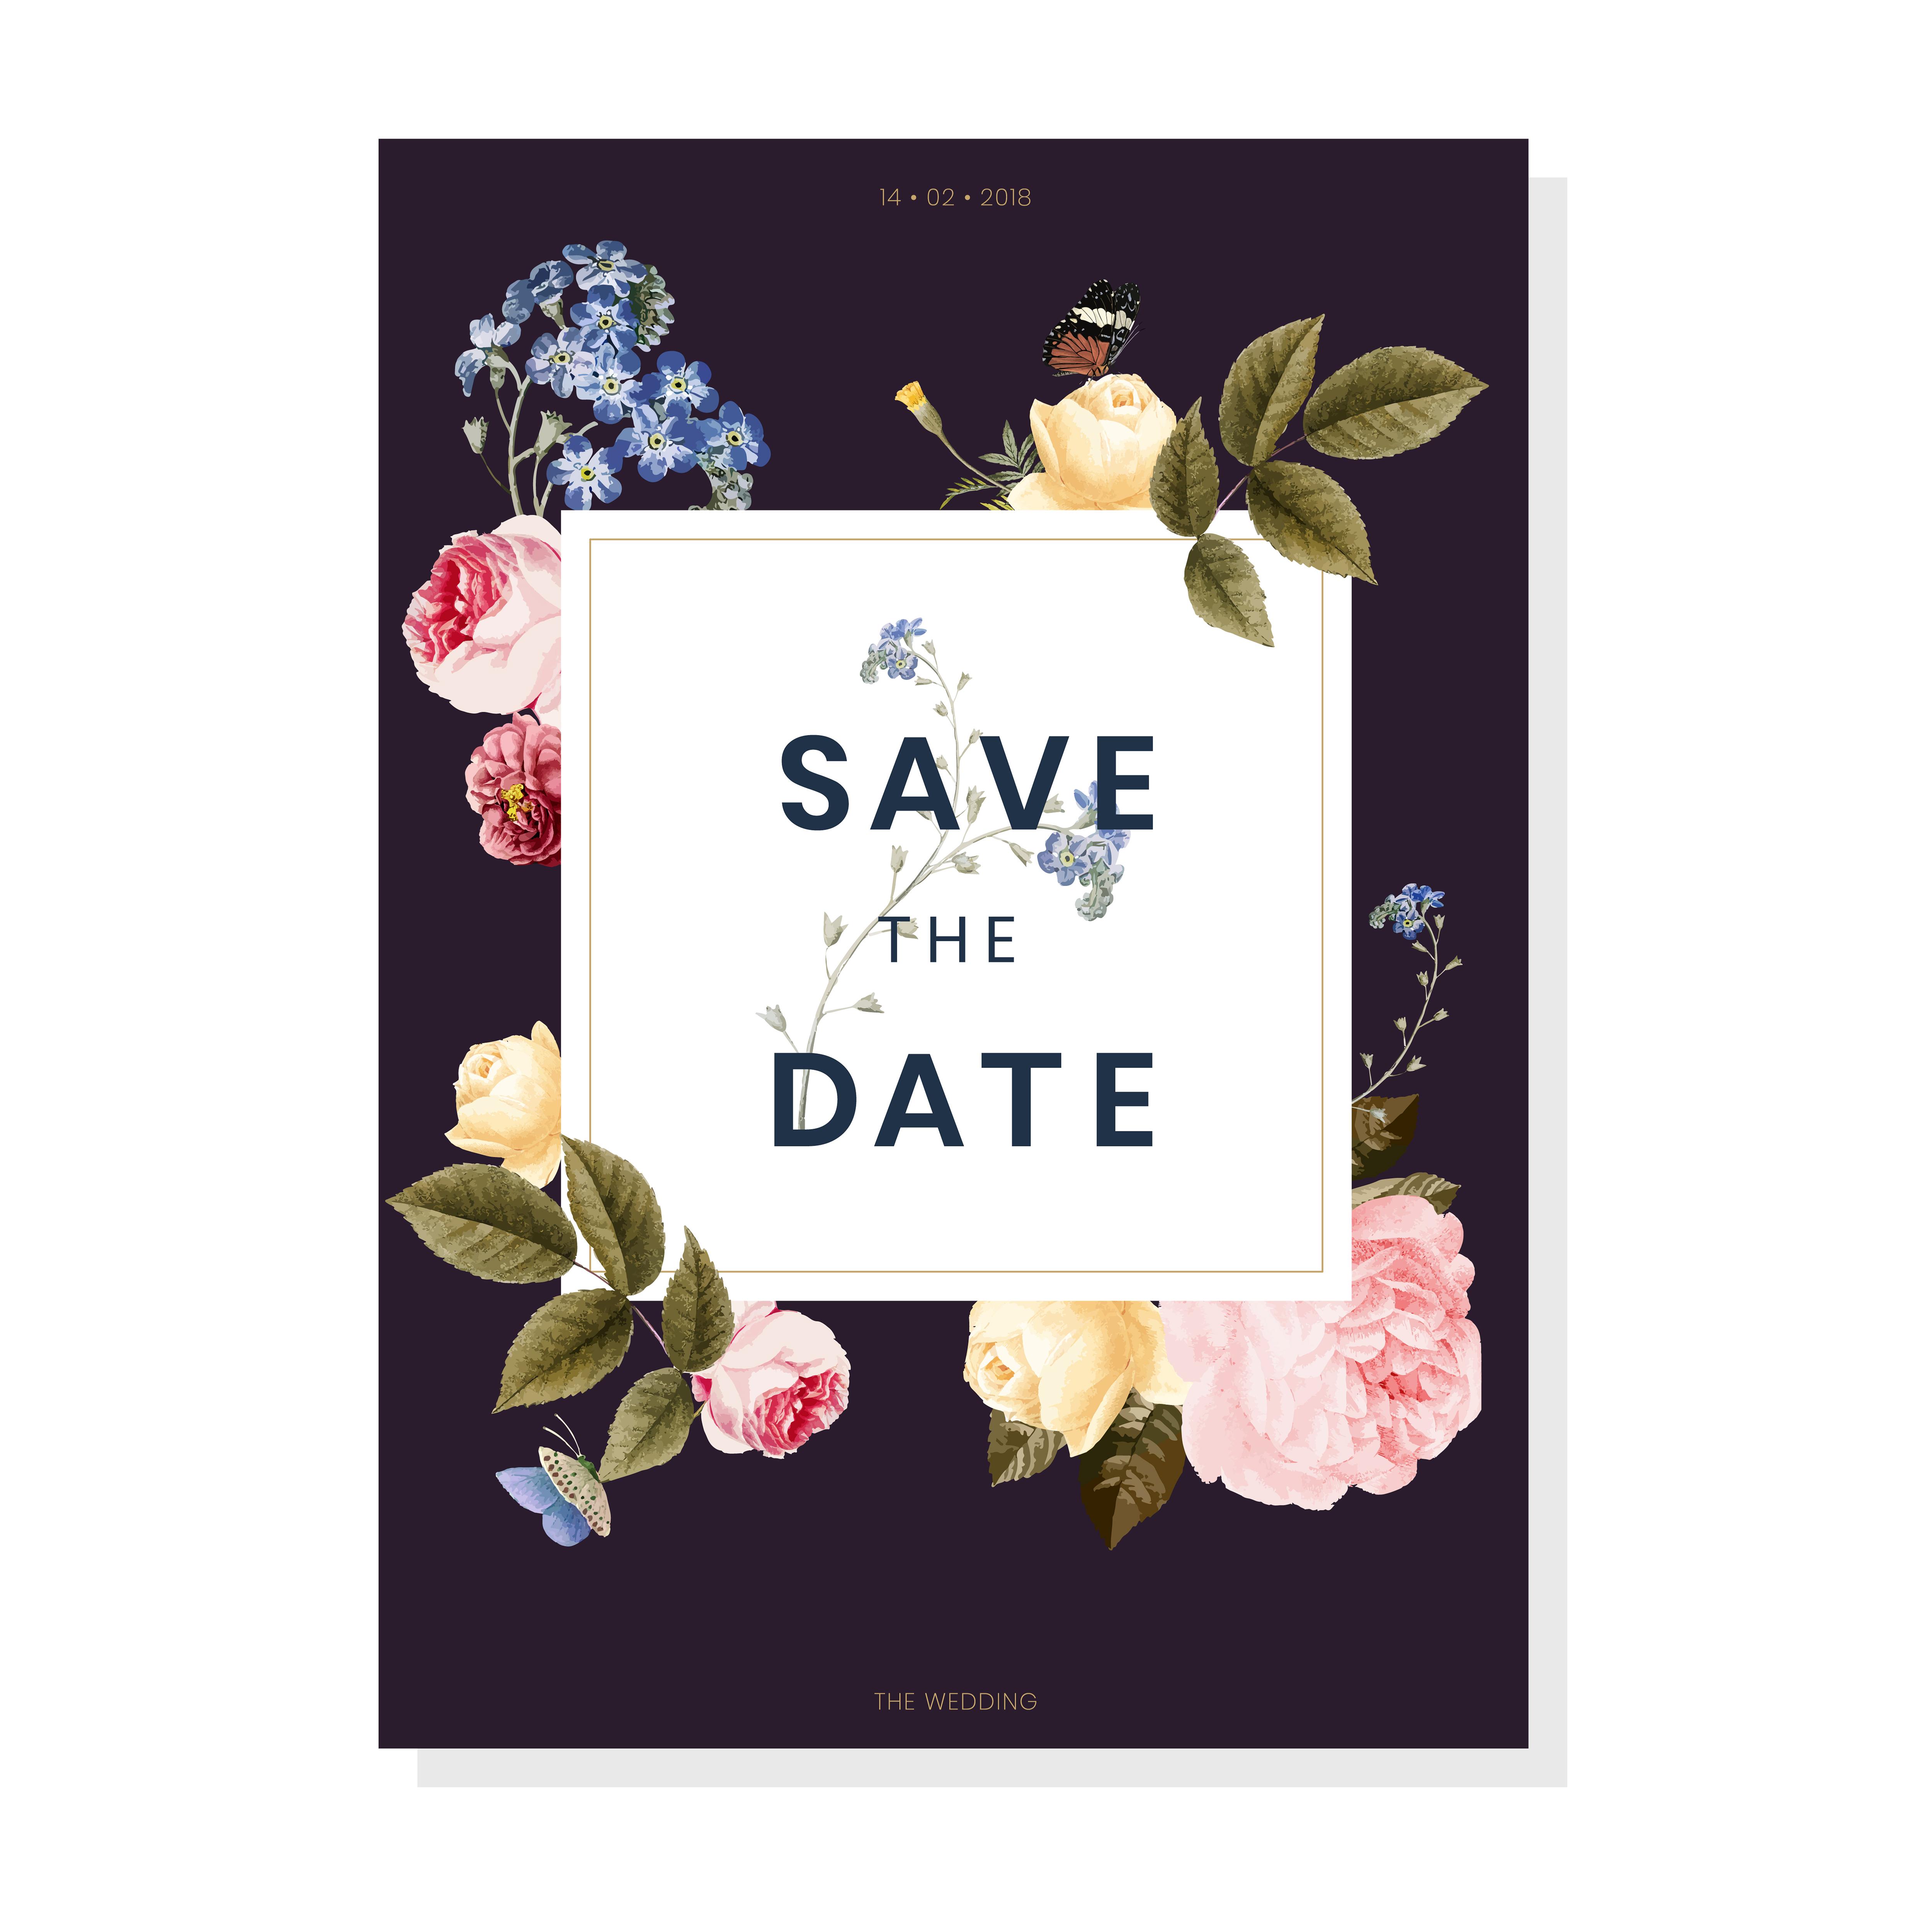 Vintage Invitation Card: Save The Date Wedding Invitation